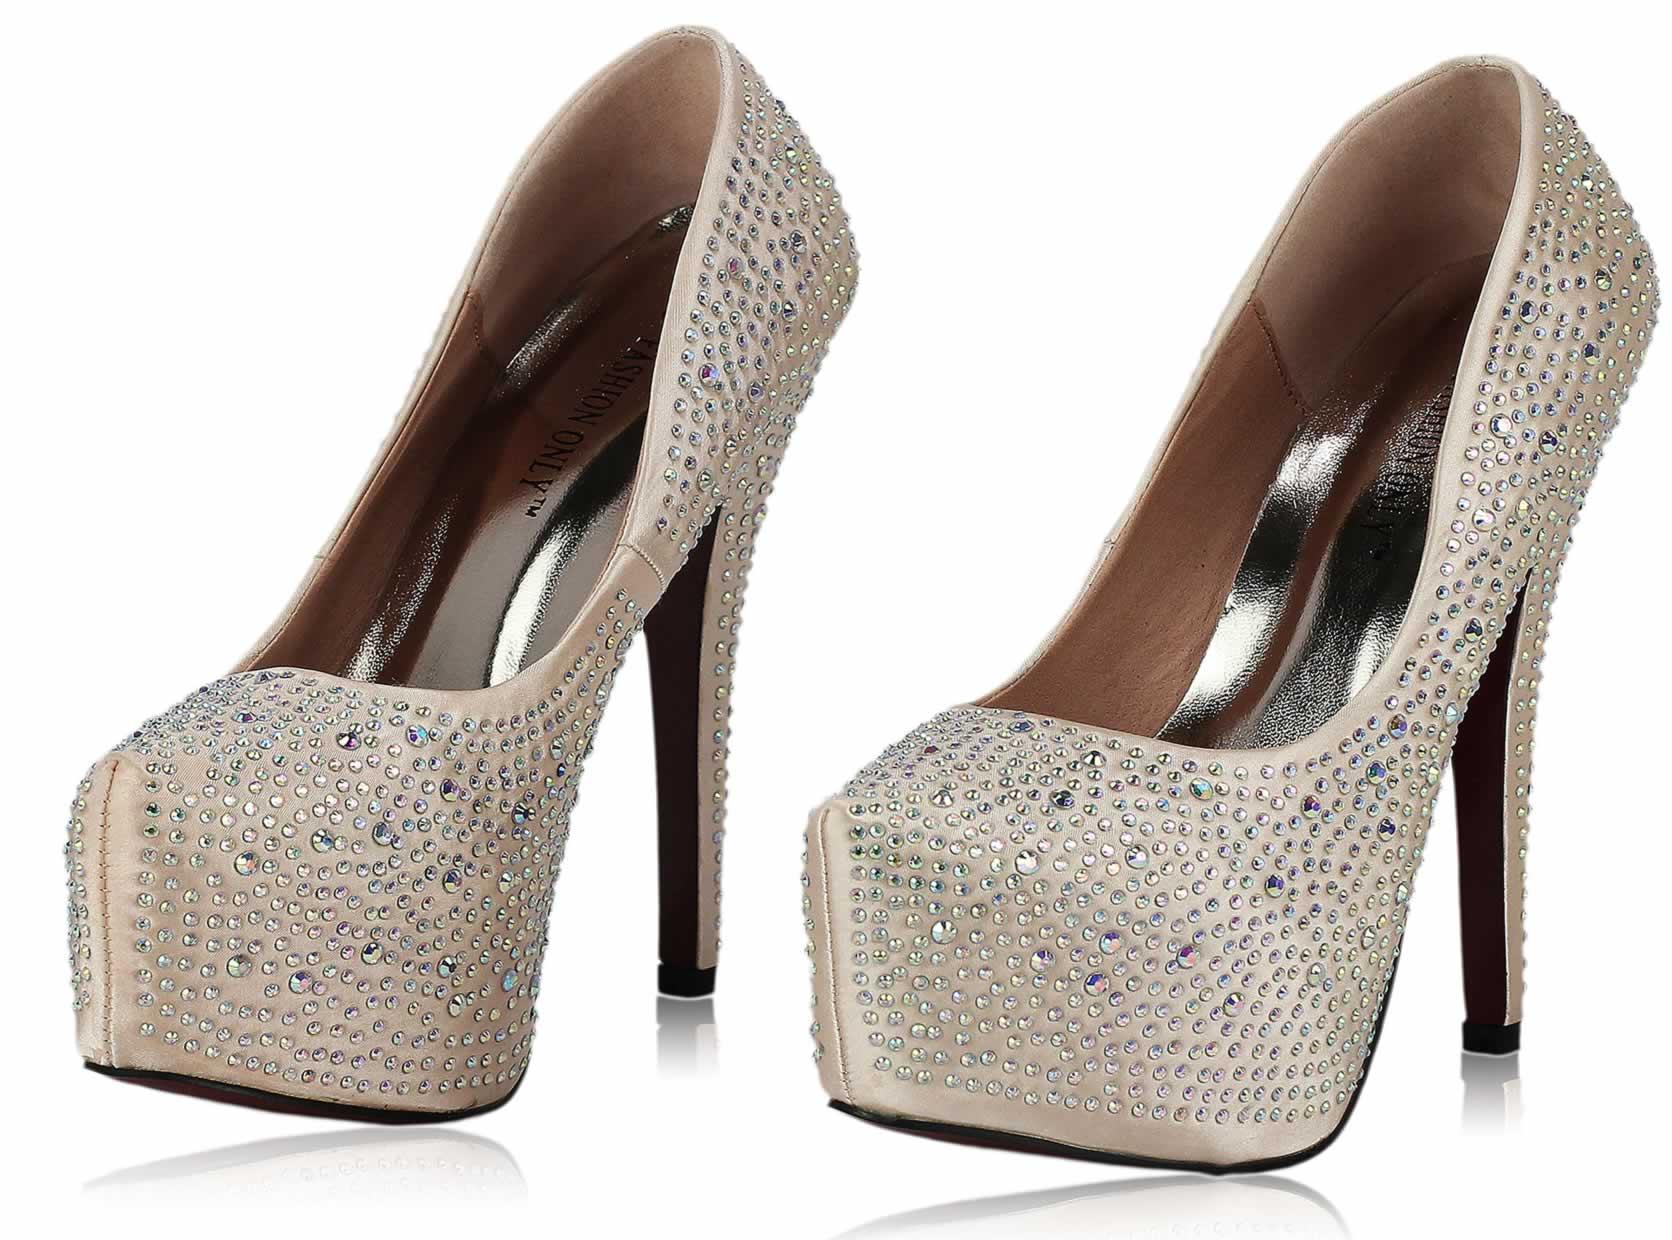 36b26af250f2 Wholesale Shoes    LSS00107 - Champagne Diamante Embellished ...